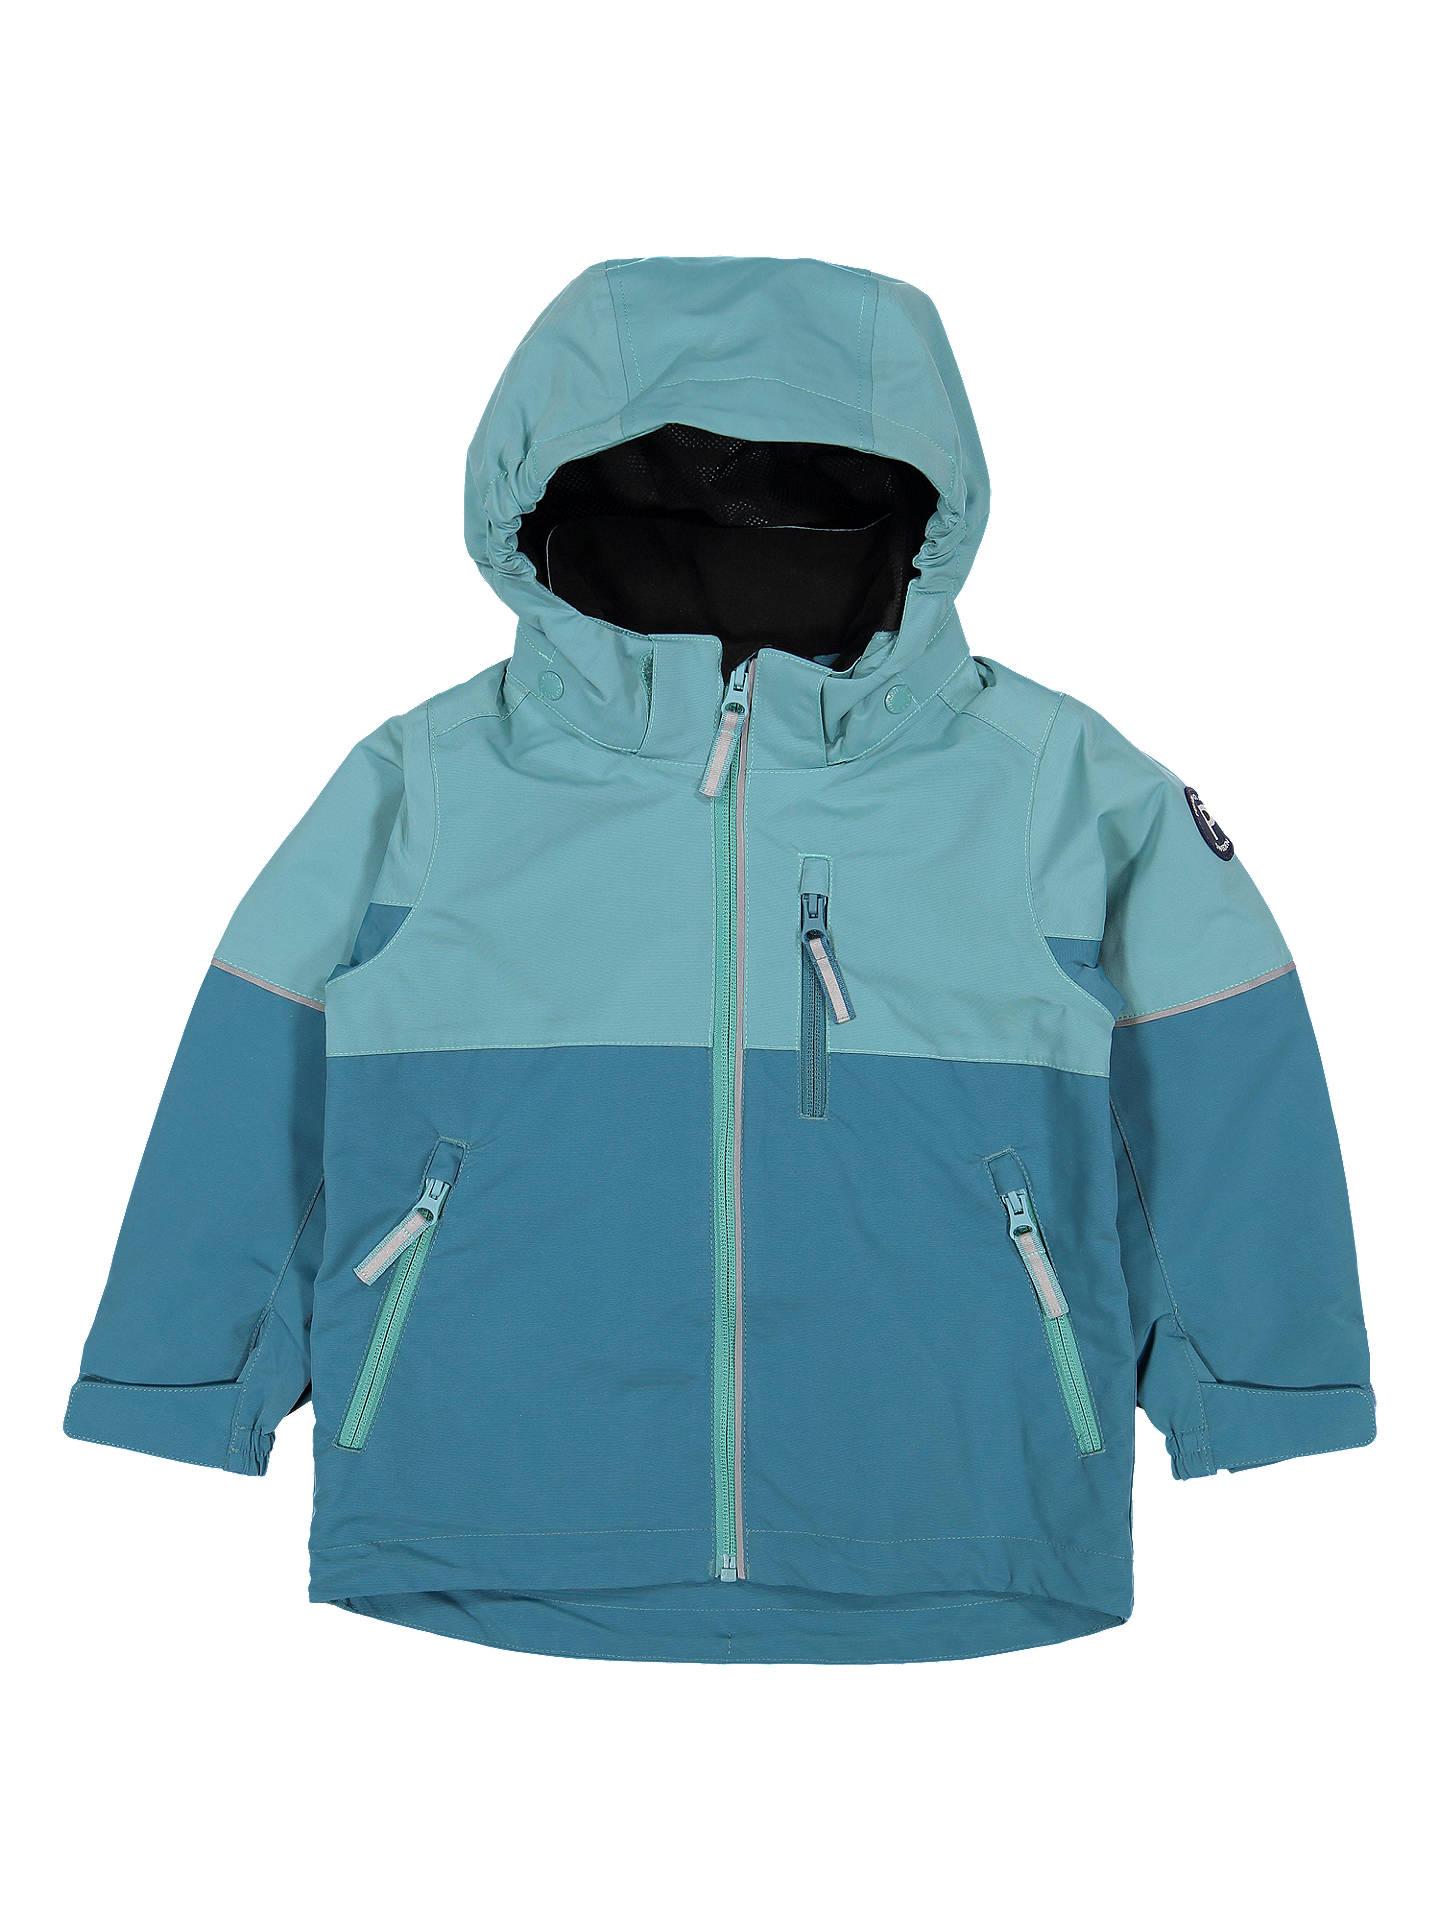 6440b3bfc091 Buy Polarn O. Pyret Children s Waterproof Shell Jacket